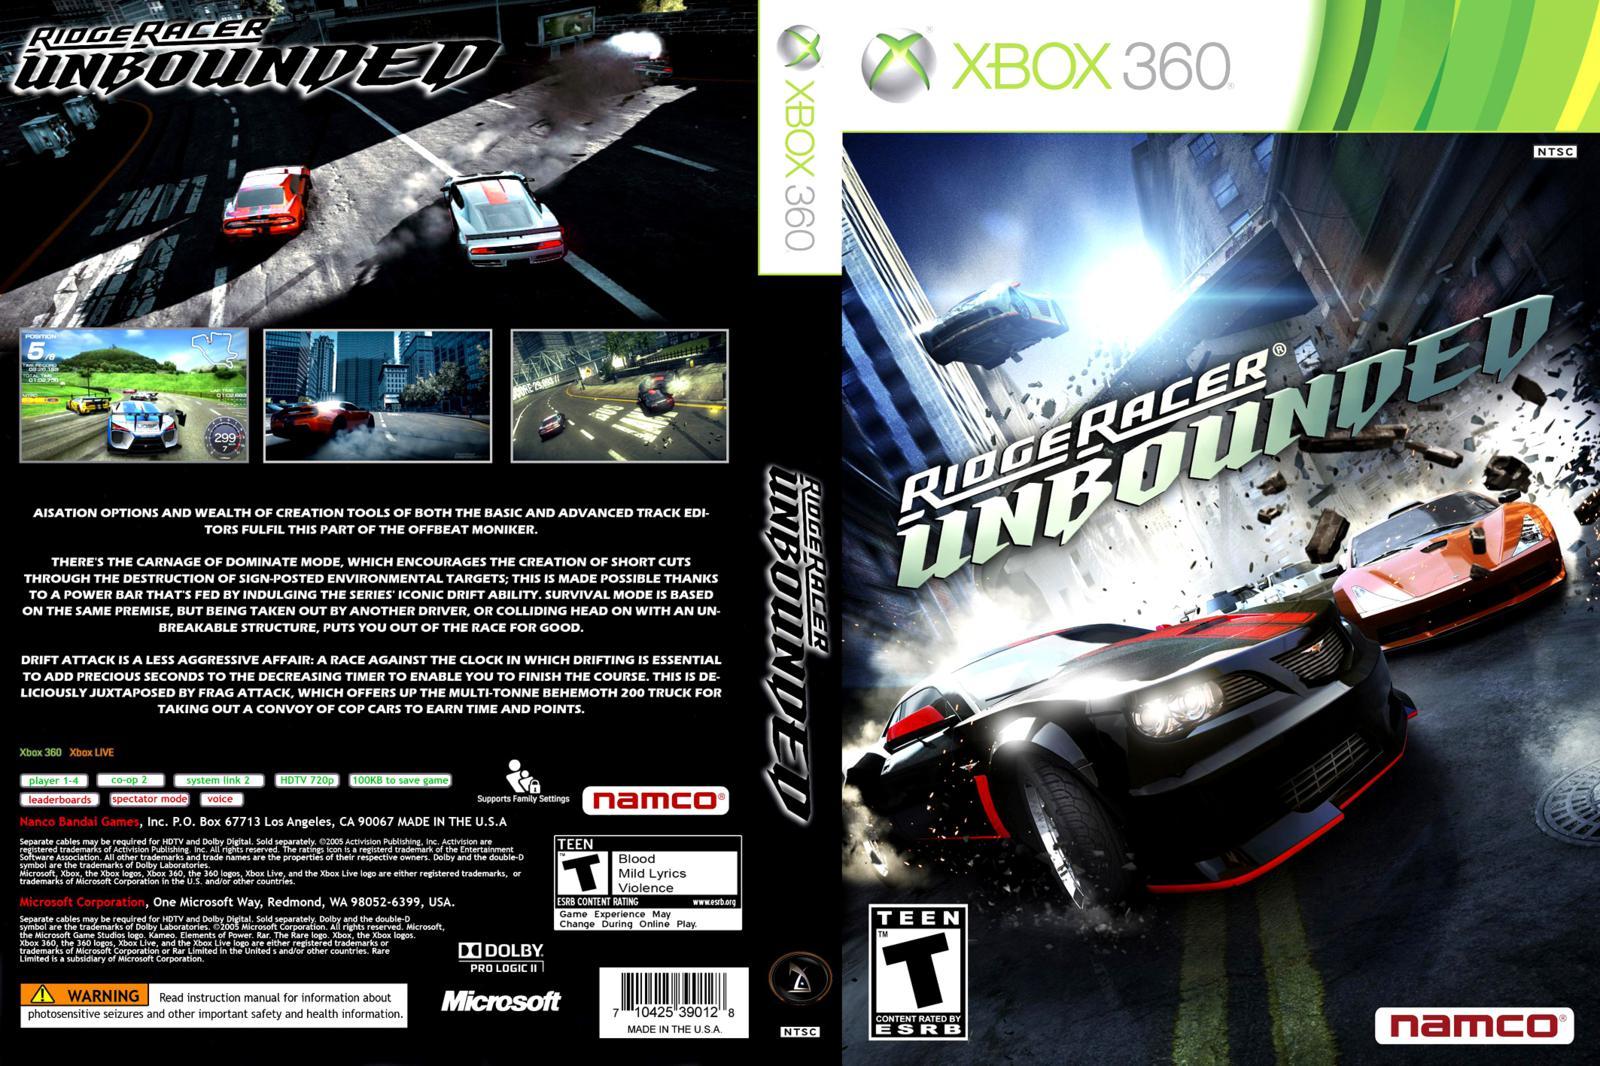 http://3.bp.blogspot.com/-iqmWuVsmOPw/T2qmUOJa0qI/AAAAAAAAQaY/tmEX5ep8_IA/s1600/capa%20www.gamecover.com%20(3).jpg